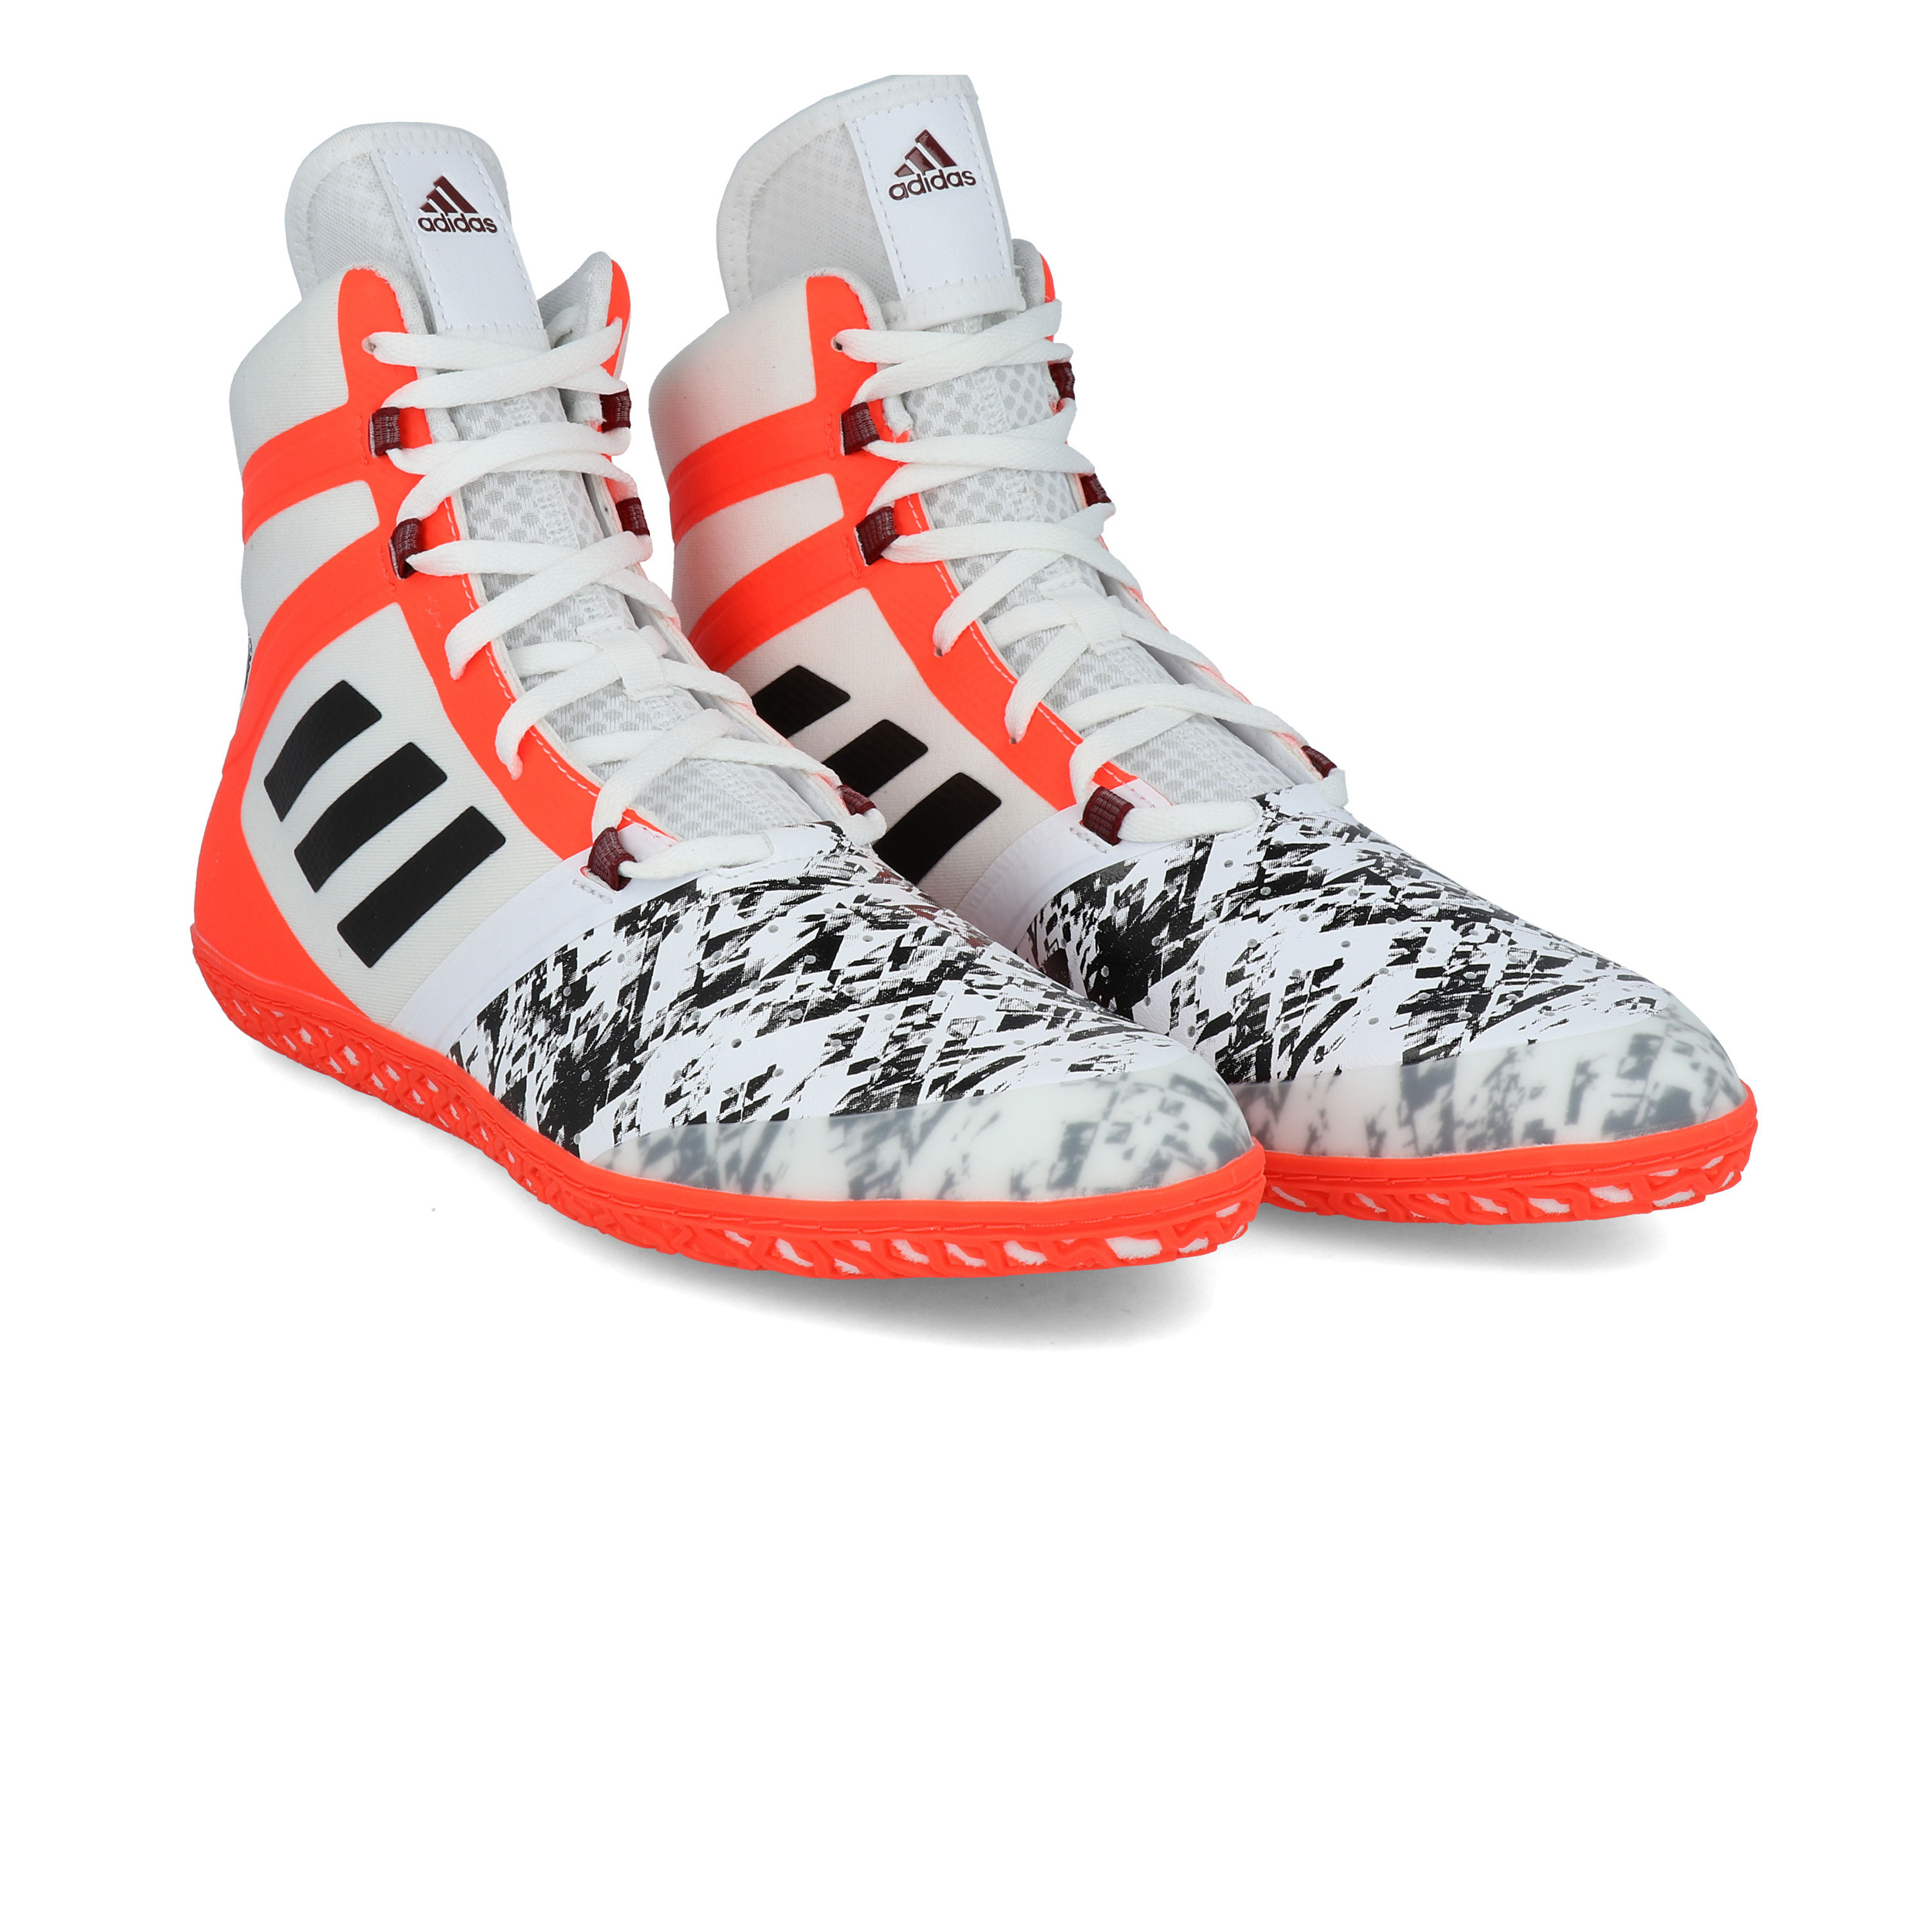 orange and black asics wrestling shoes